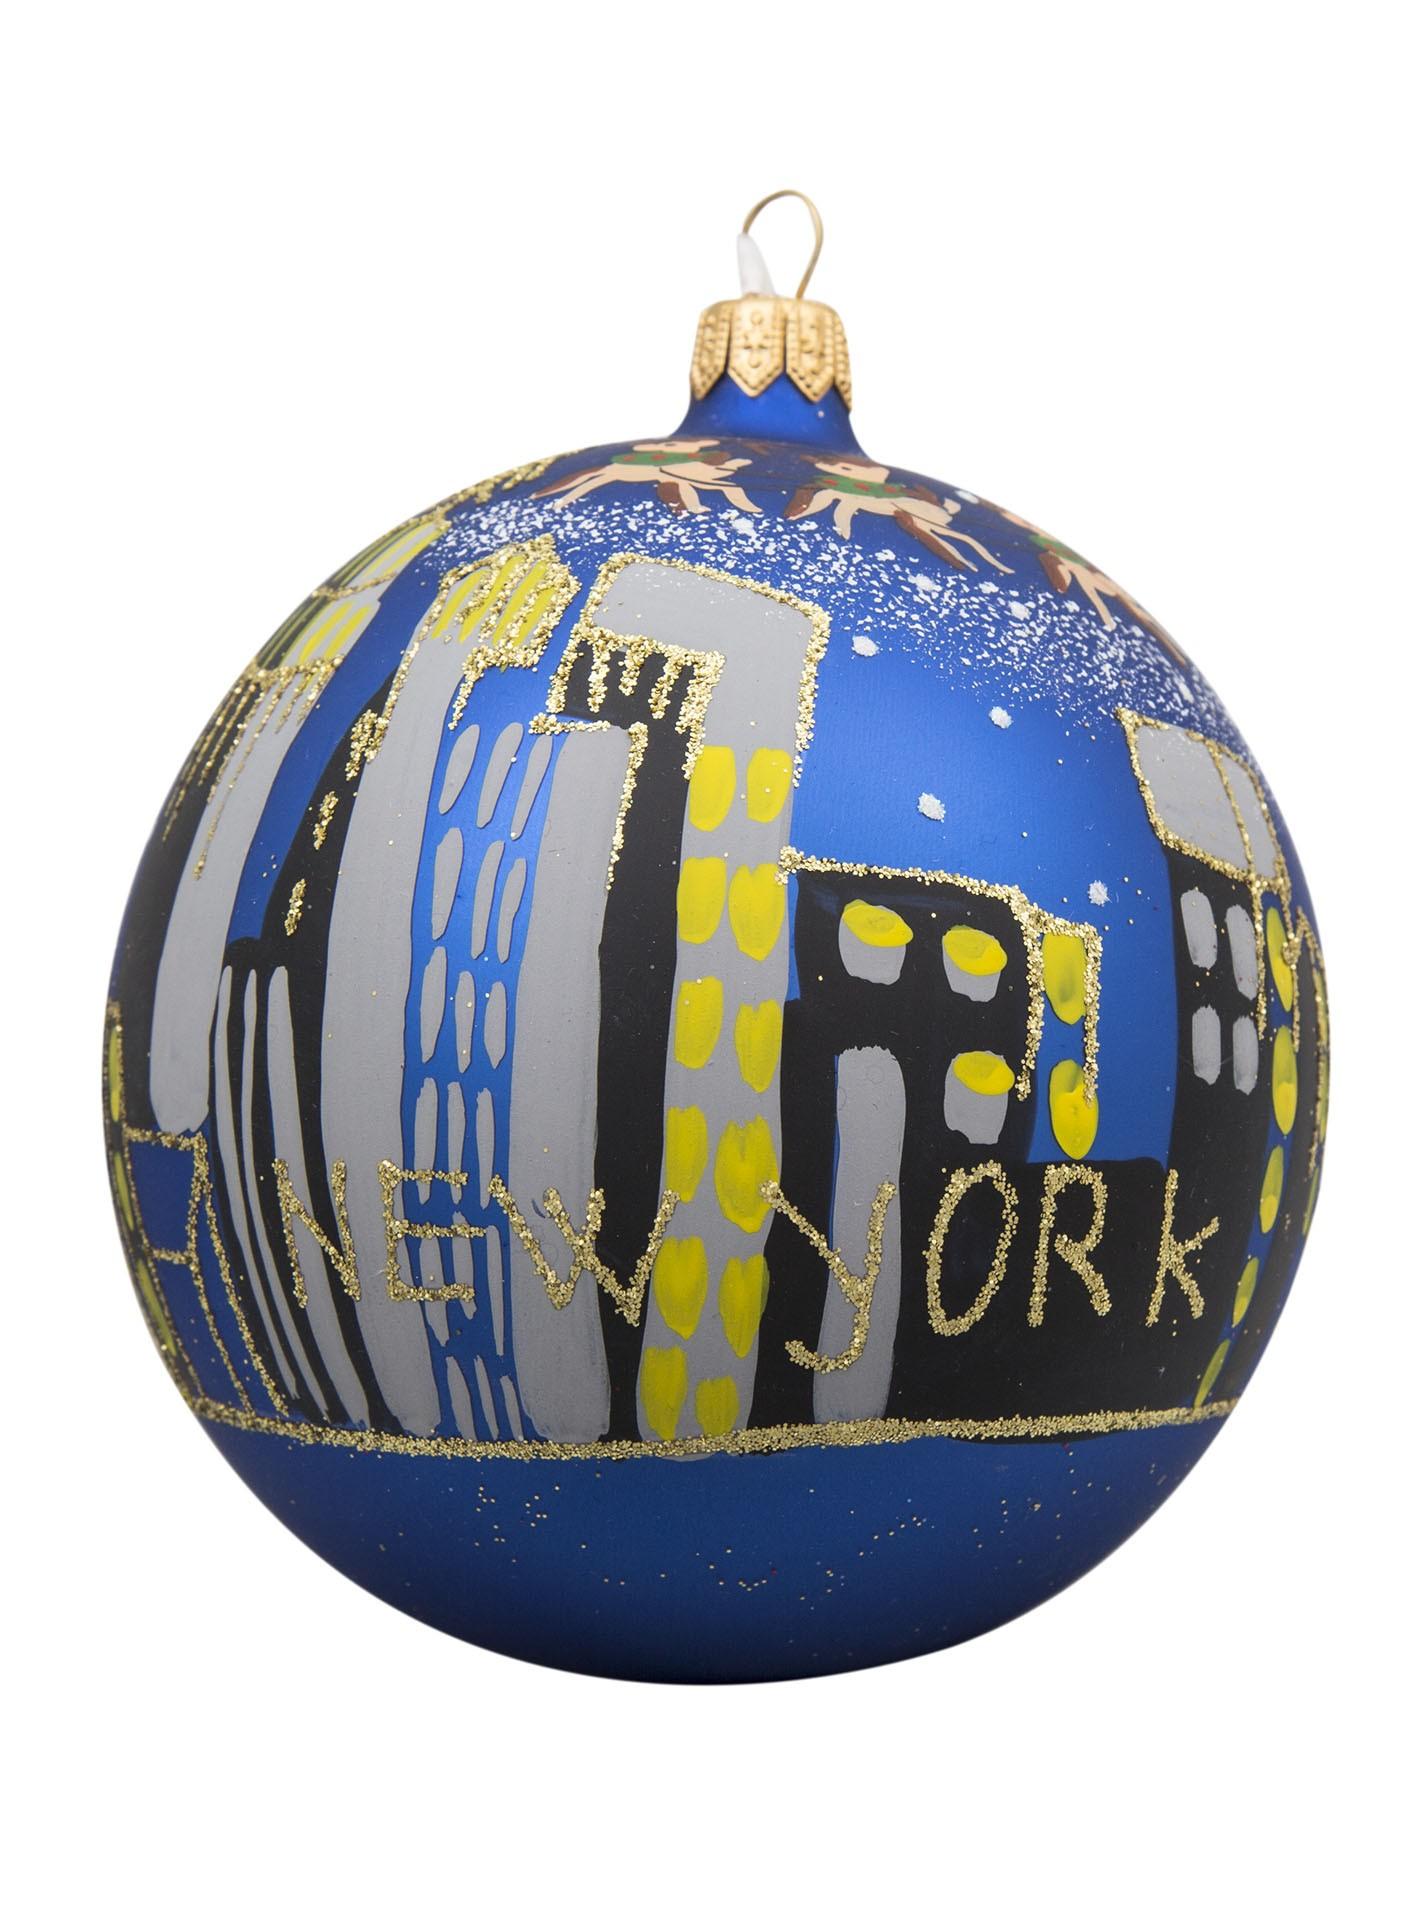 NYC Skyline with Santa Sleigh Blue Glass Ball Christmas Ornament